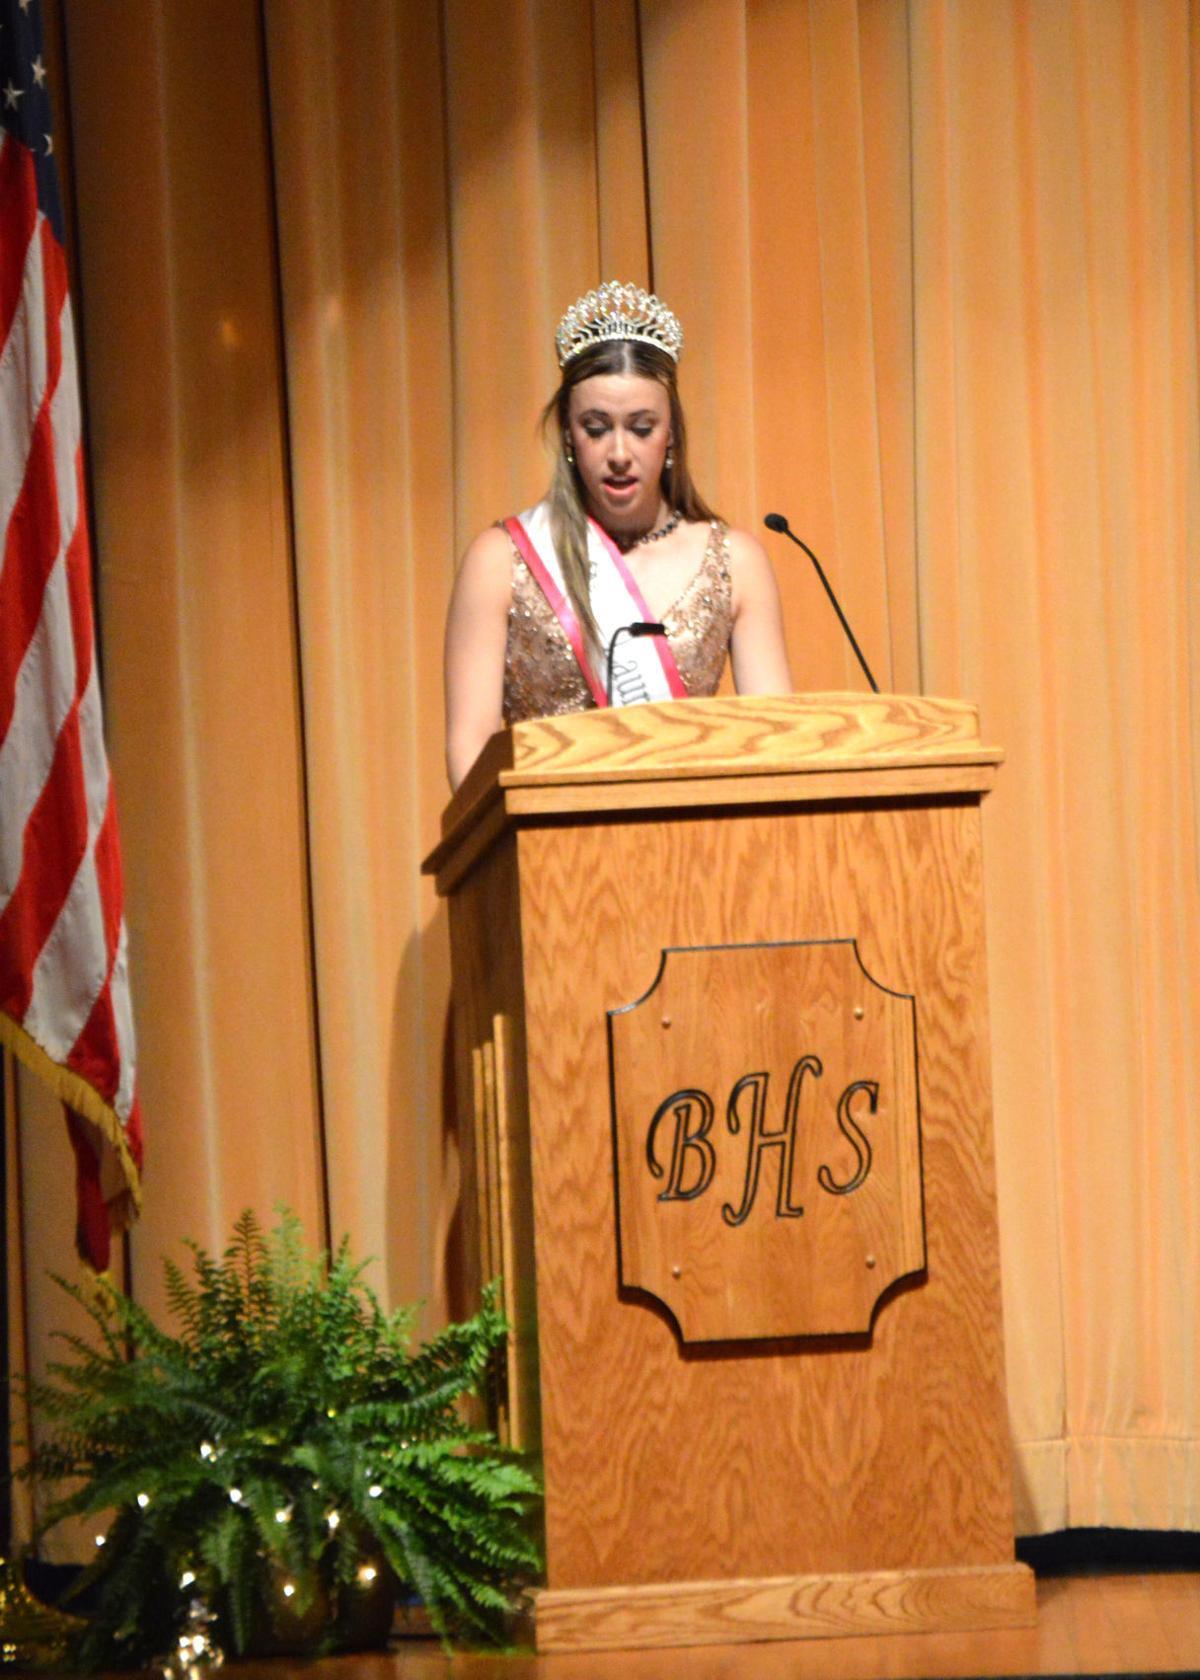 Outgoing 2016 Western Pennsylvania Laurel Festival Queen